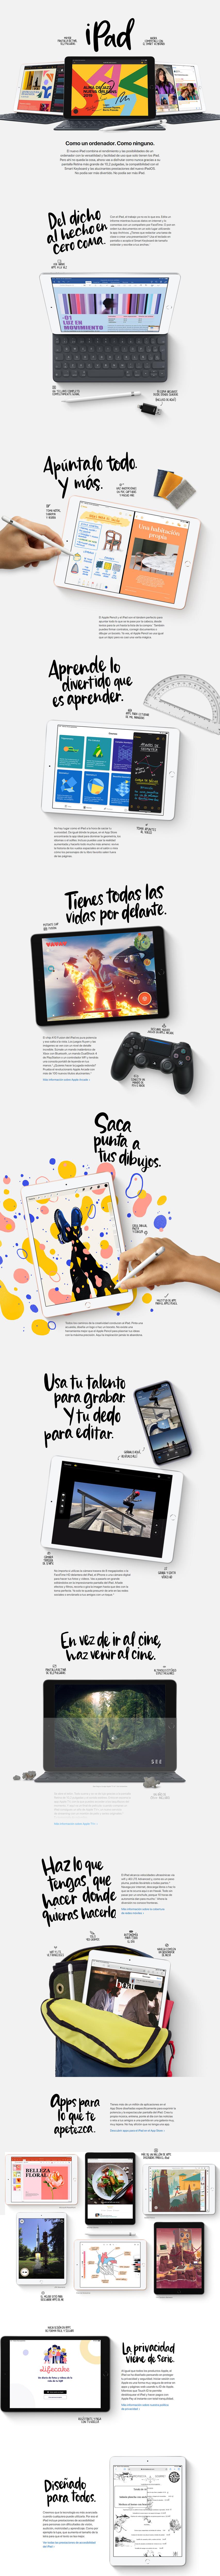 iPad barato 2019 de 10,2 en Tenerife